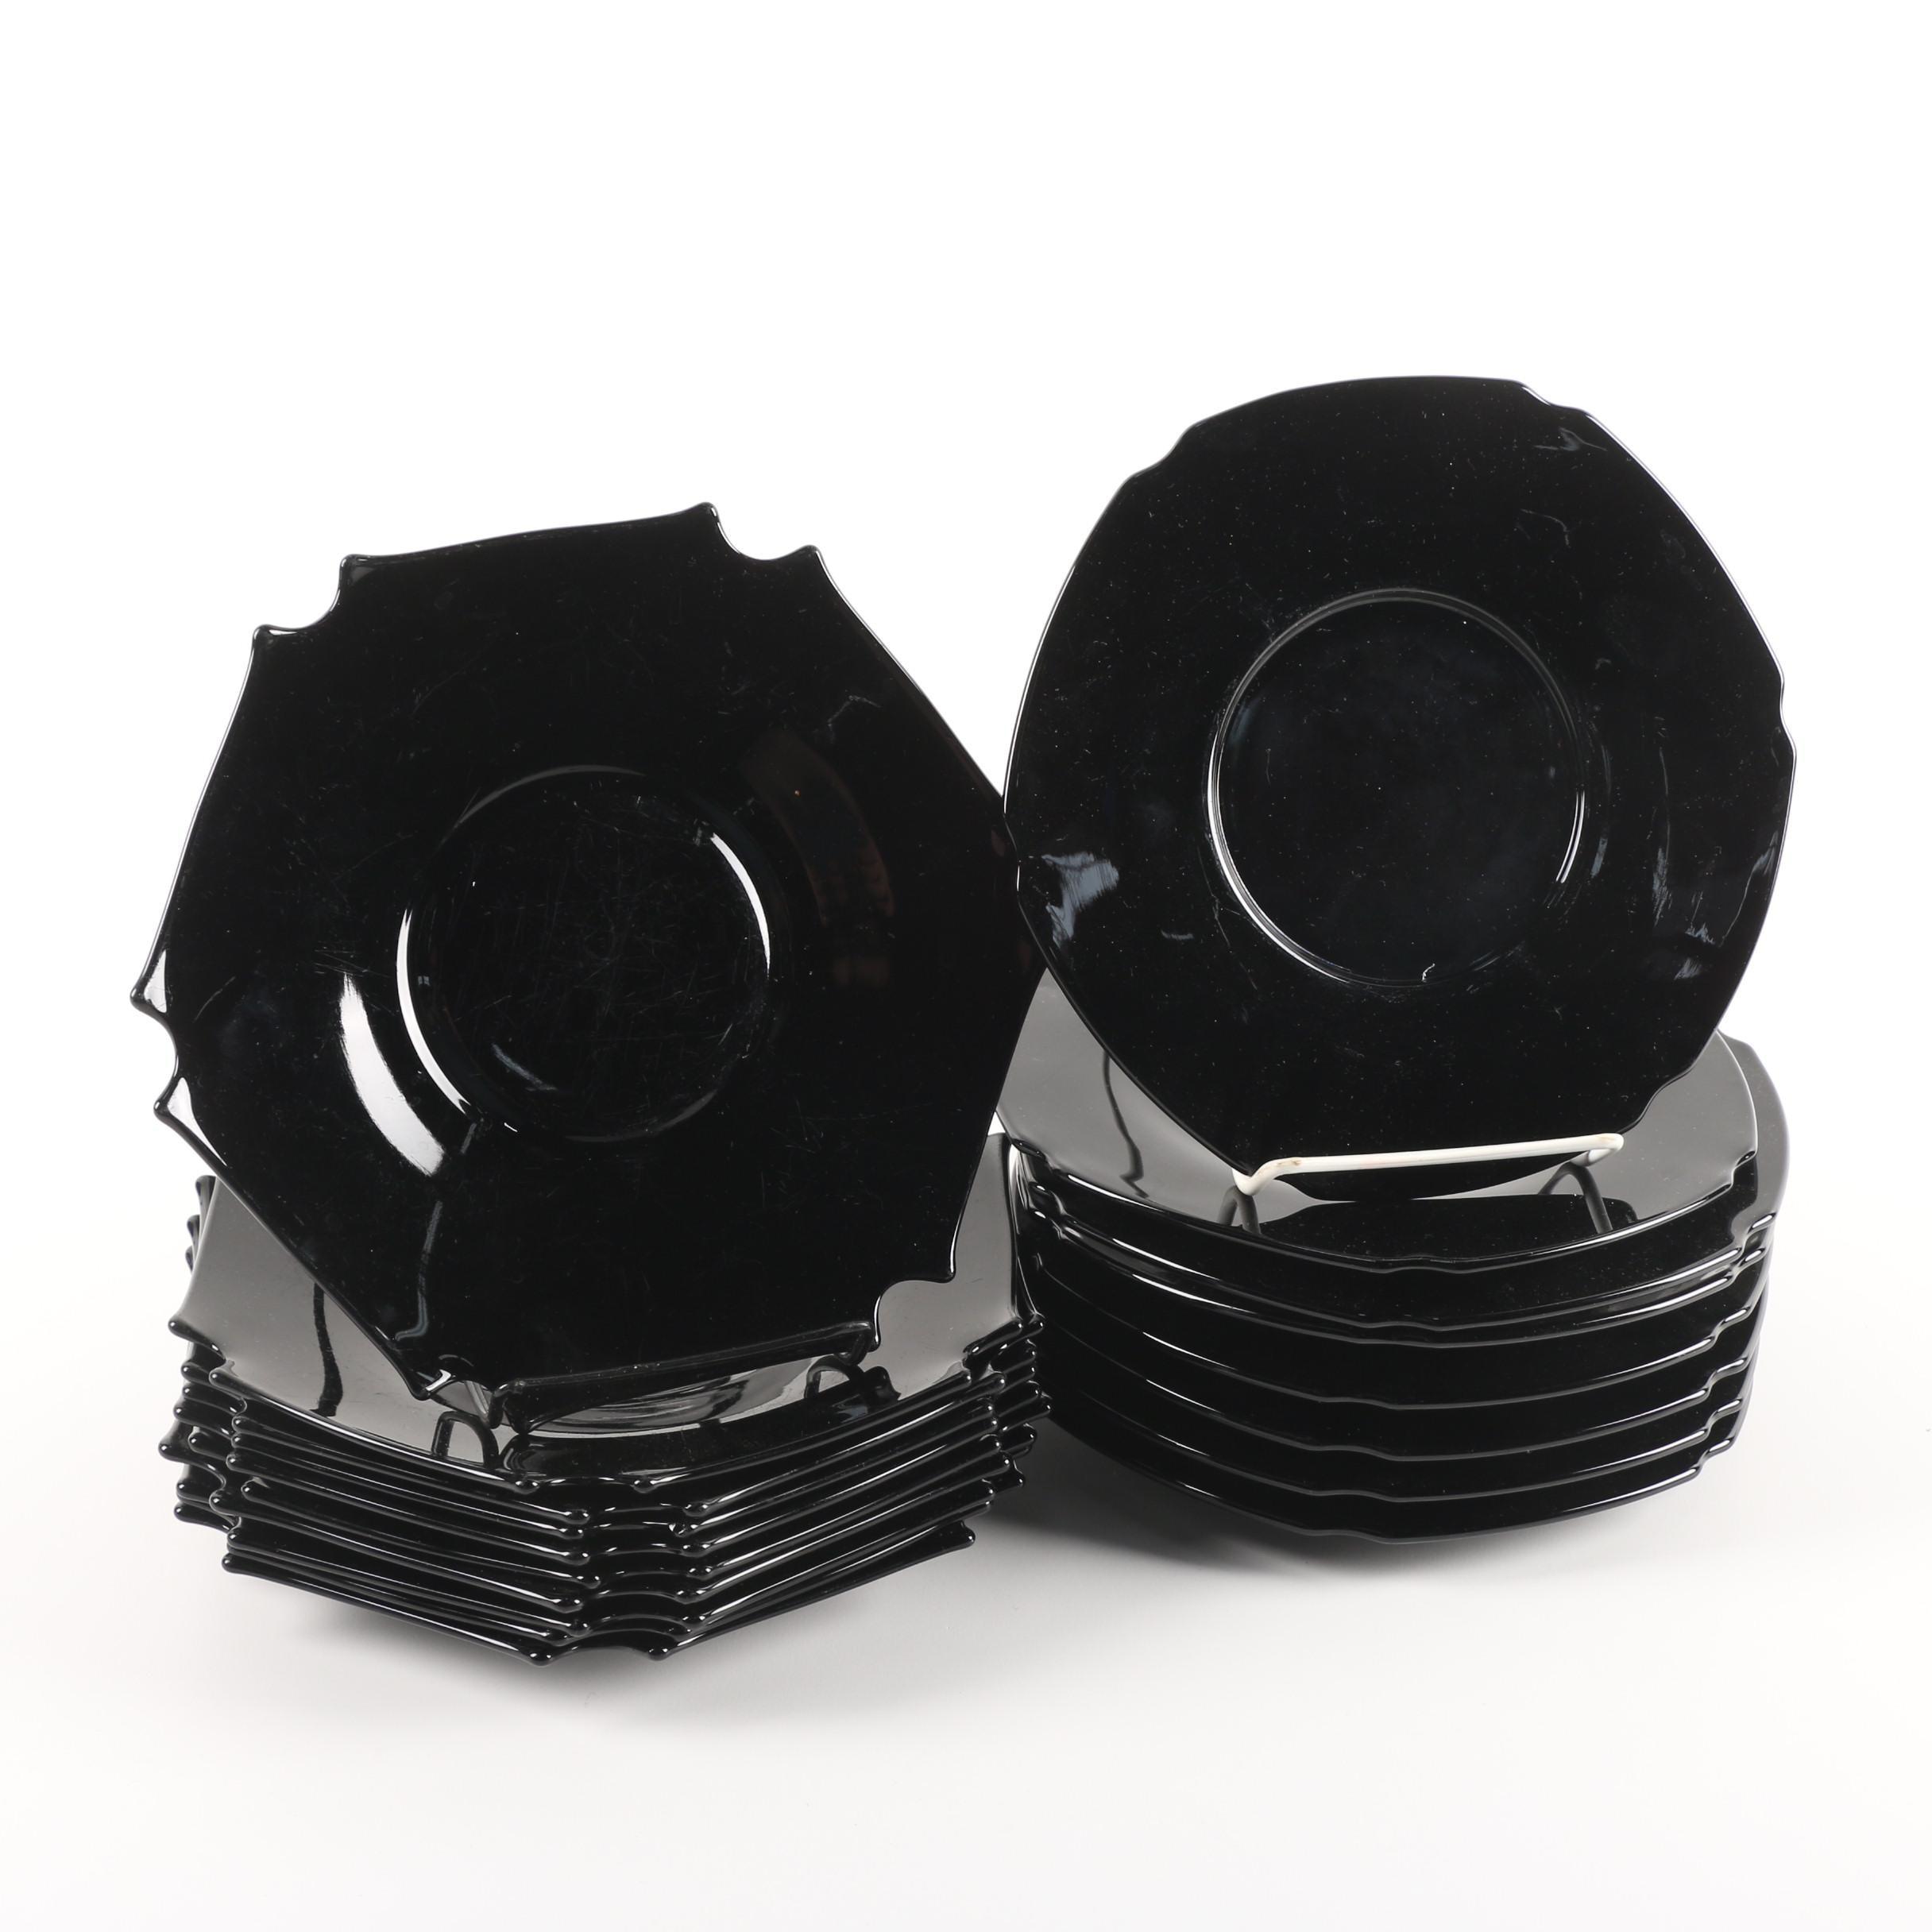 Tiara Exclusives Black Amethyst Glass Plates c.1970's